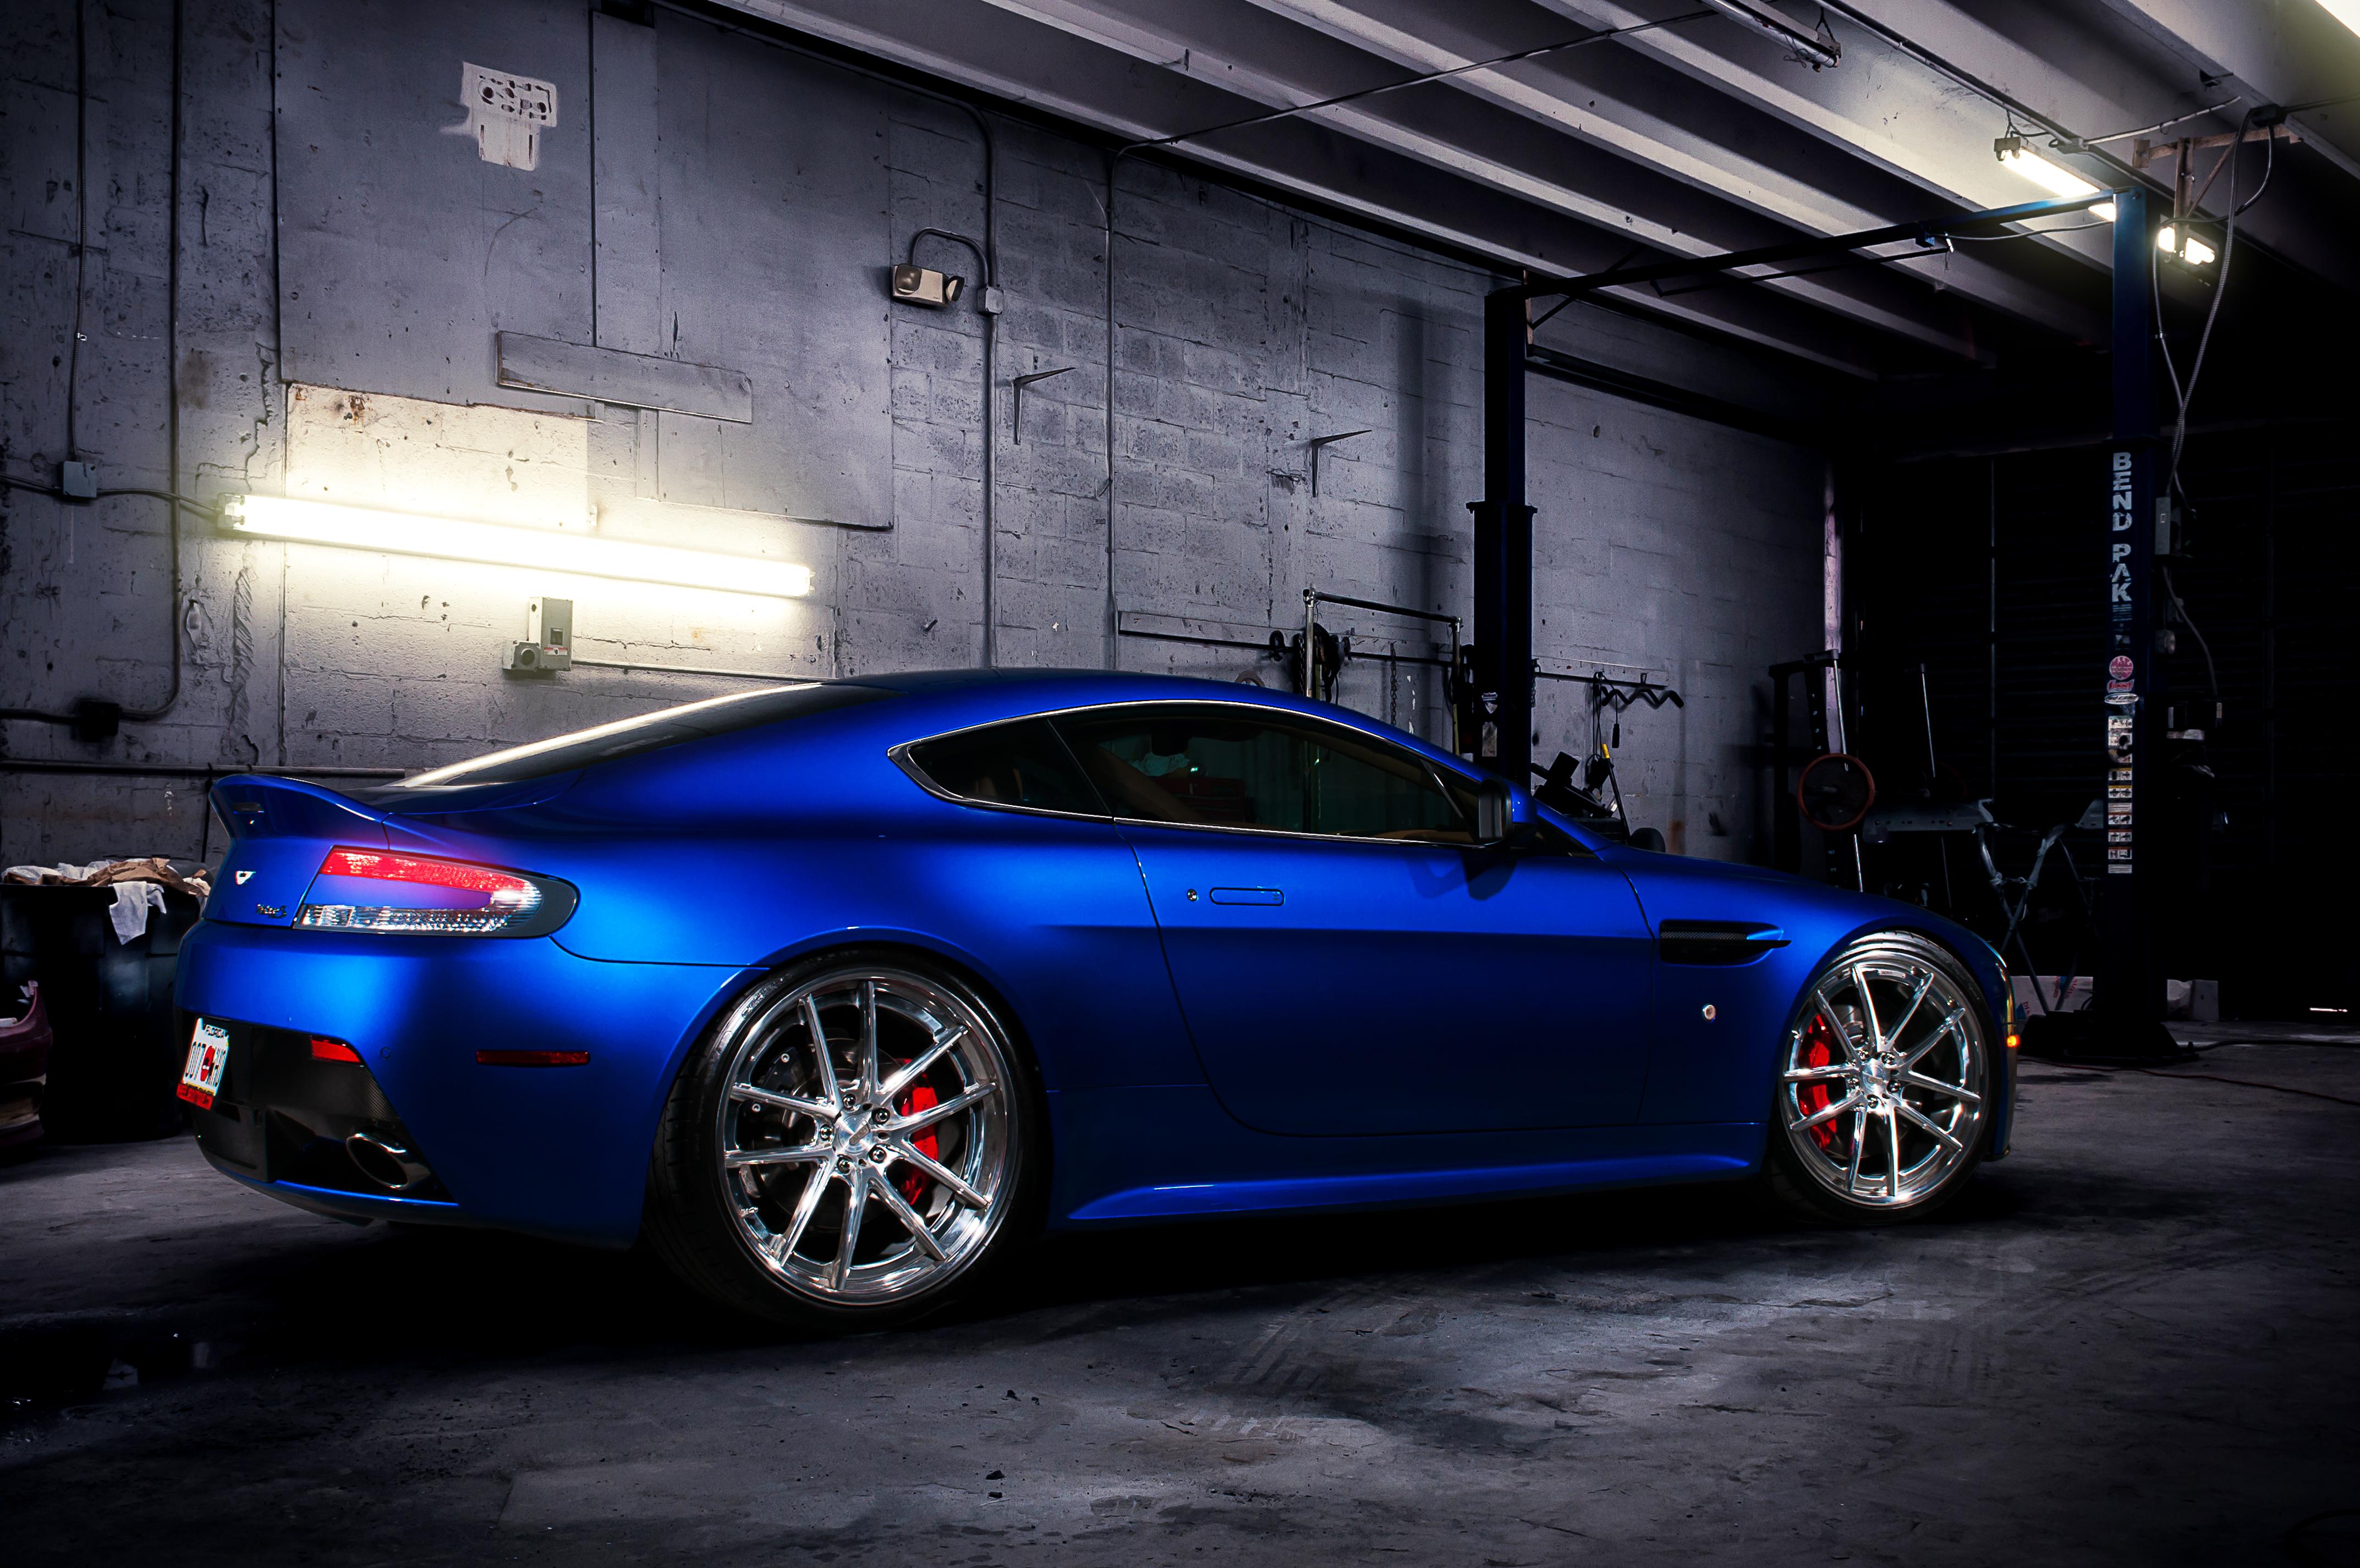 Wallpaper : Blue, Technology, Nikon, Wheels, Sports Car, Garage, Miami, Aston  Martin DBS, Coupe, Rims, Florida, Performance Car, Aston Martin DB9, Aston  ...